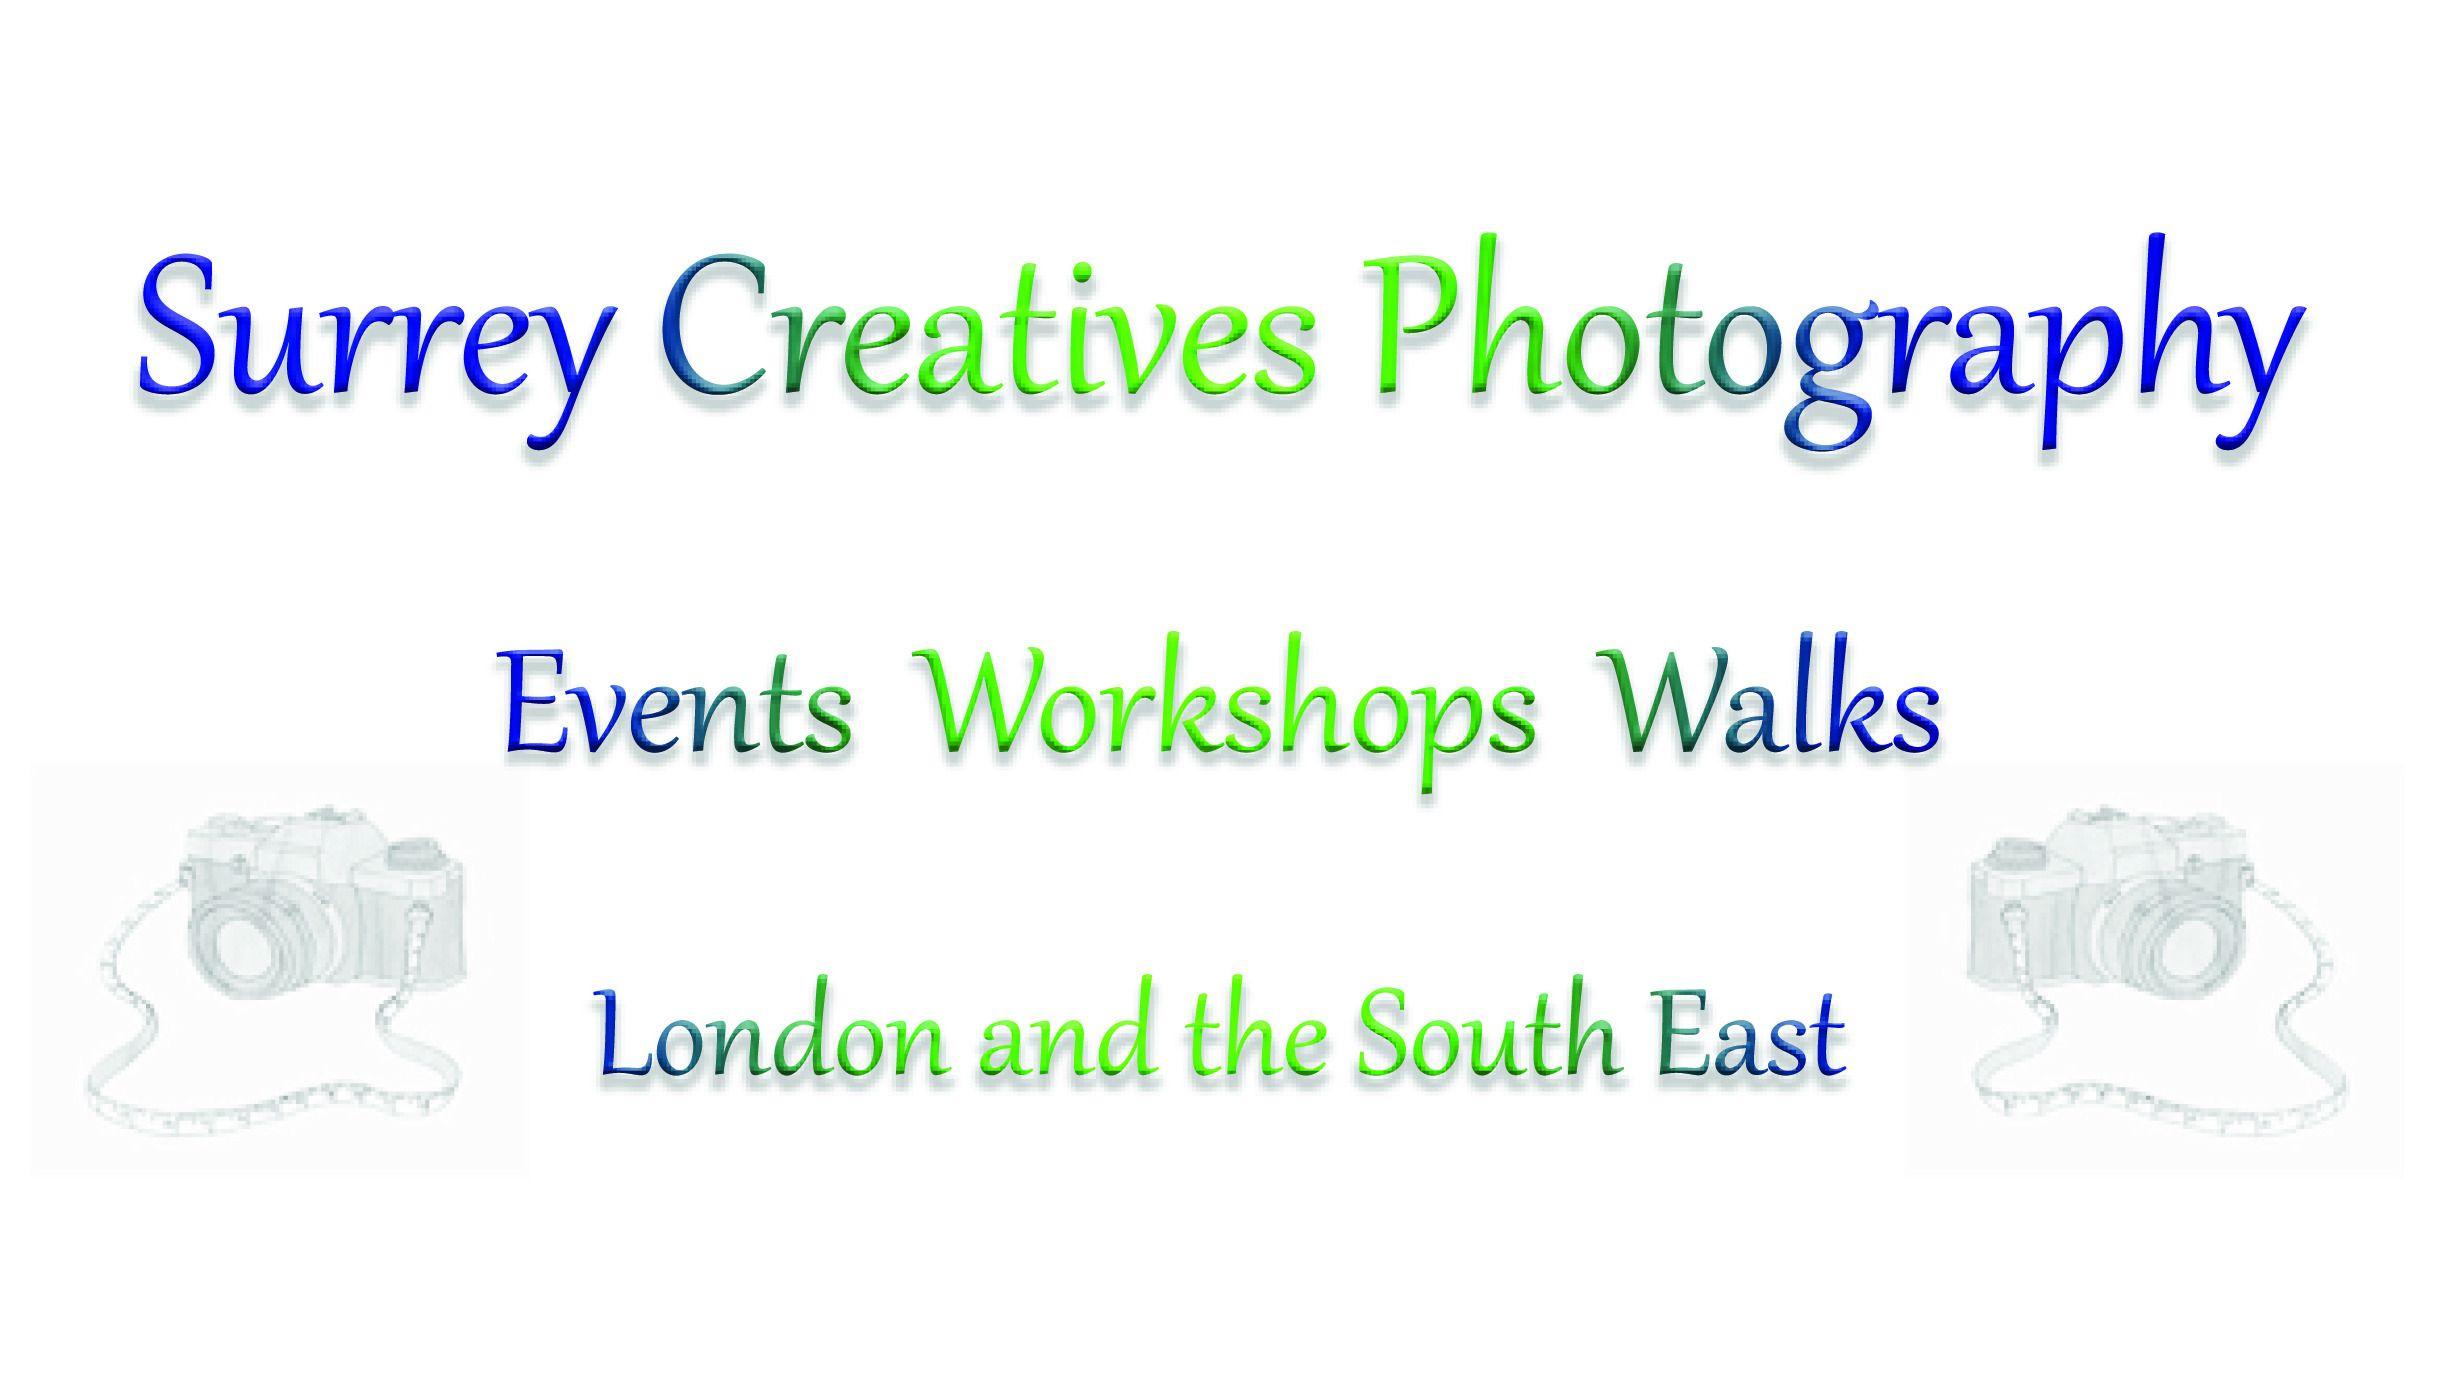 Surrey Creatives Photography